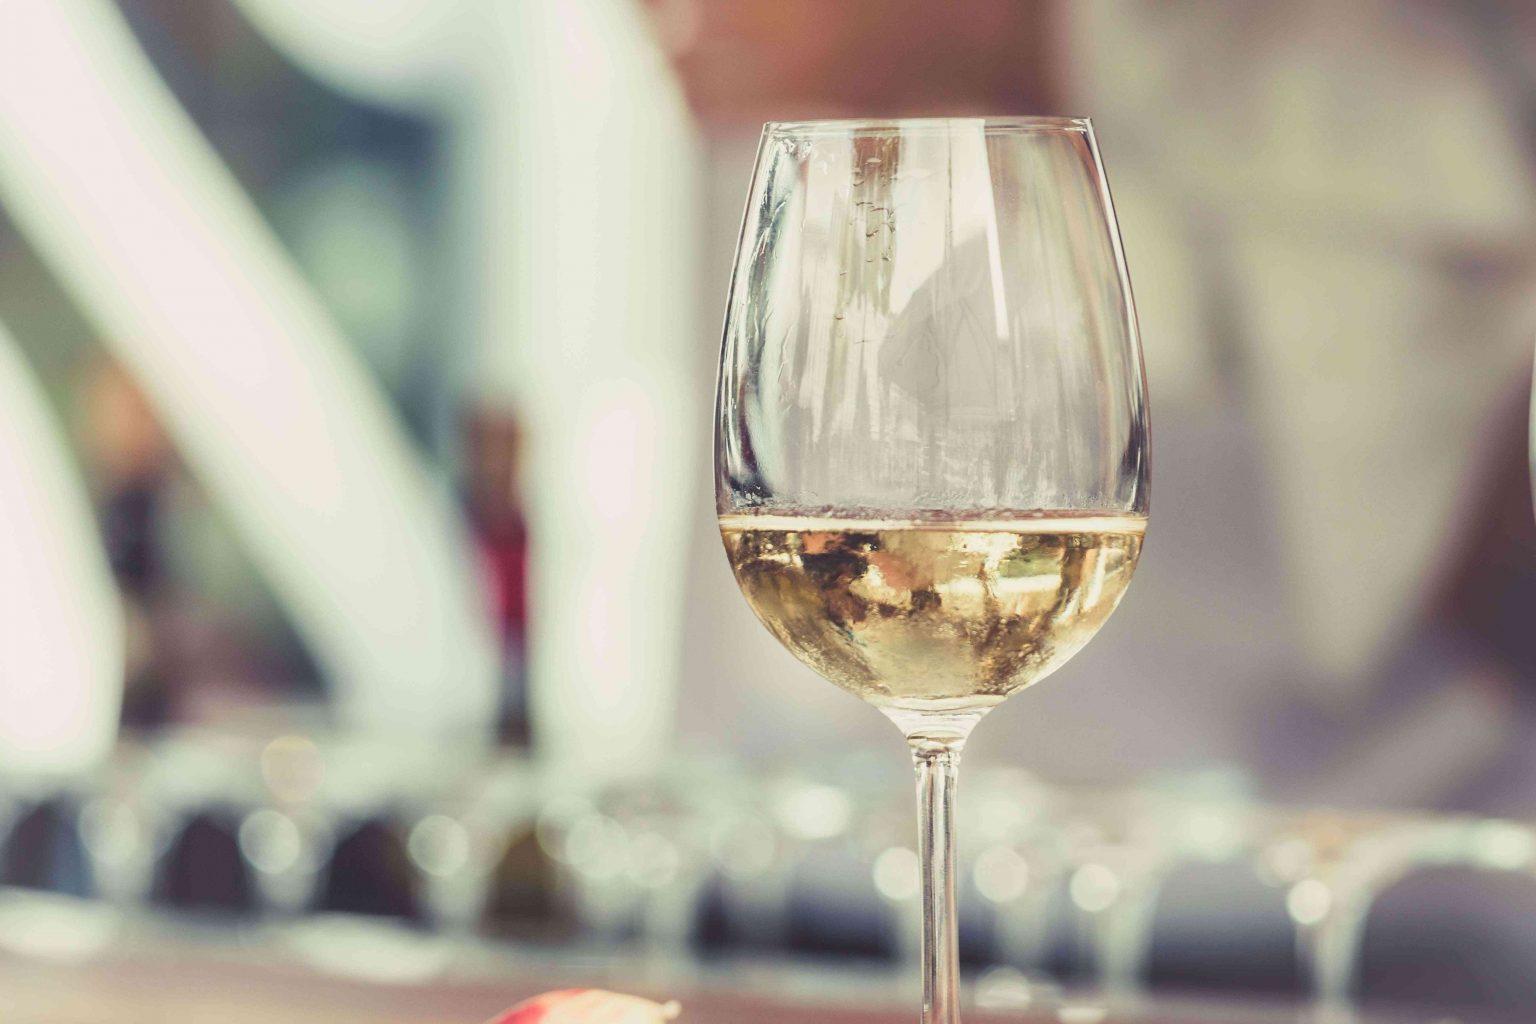 pairing-wine-with-food-teachworkoutlove.com